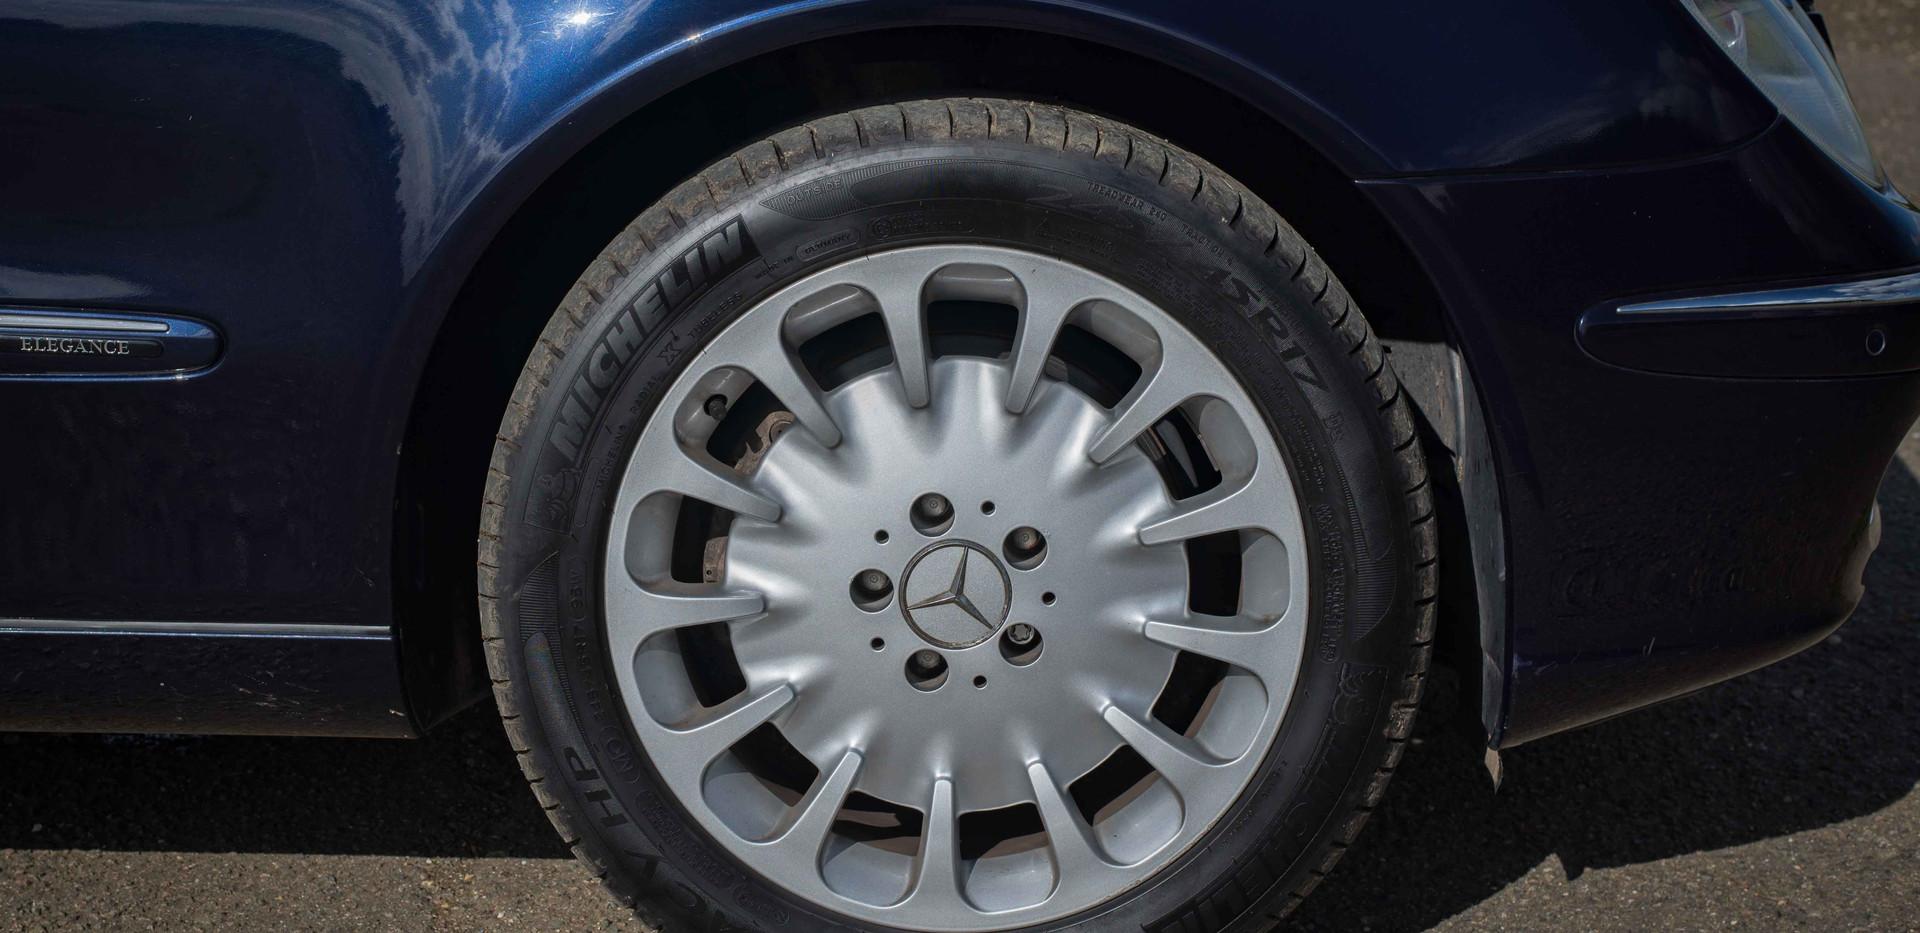 Mercedes E500 For Sale UK London  (22 of